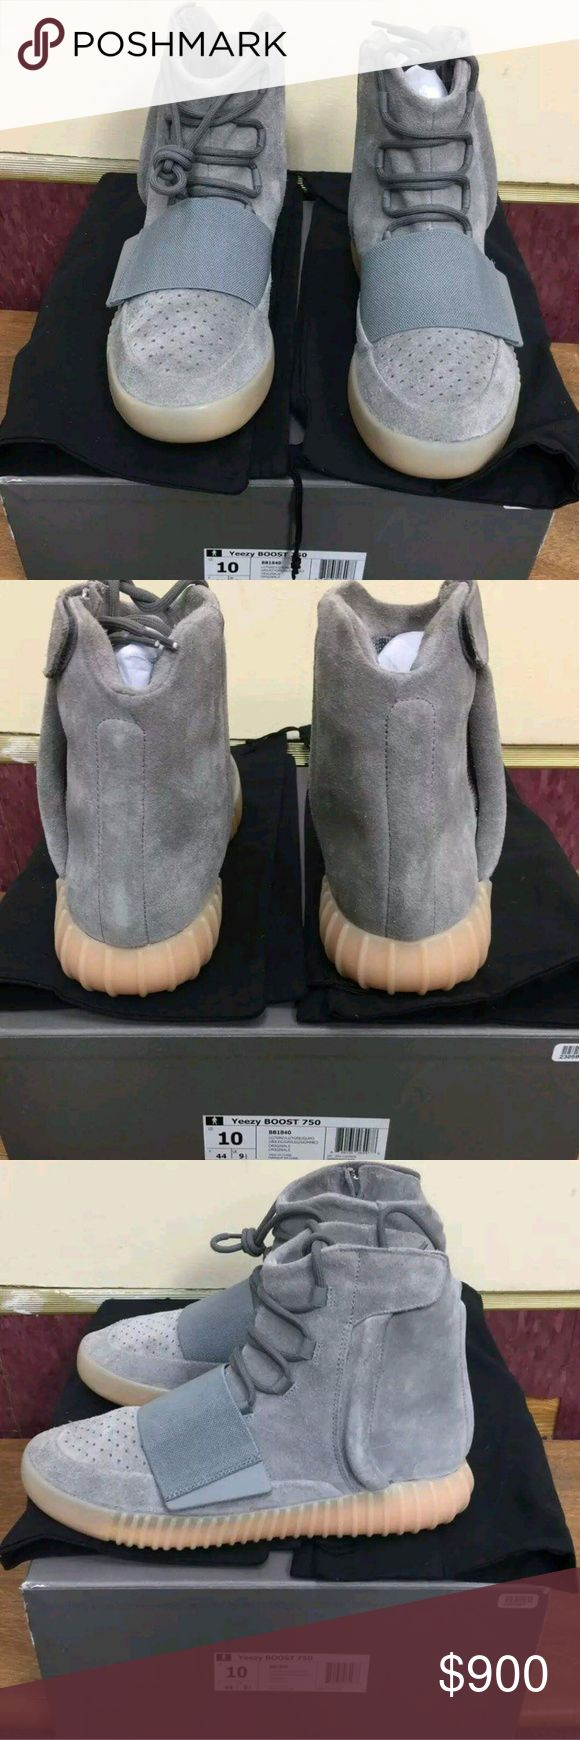 Yeezy Boost 750 W/Receipts Size 10 Brand new deadstock Receipt Yeezy Boost Clean Bottom never worn Make Offers or deals Brand new Yeezy Txt 404 - 602. -2558 Yeezy Shoes Sneakers